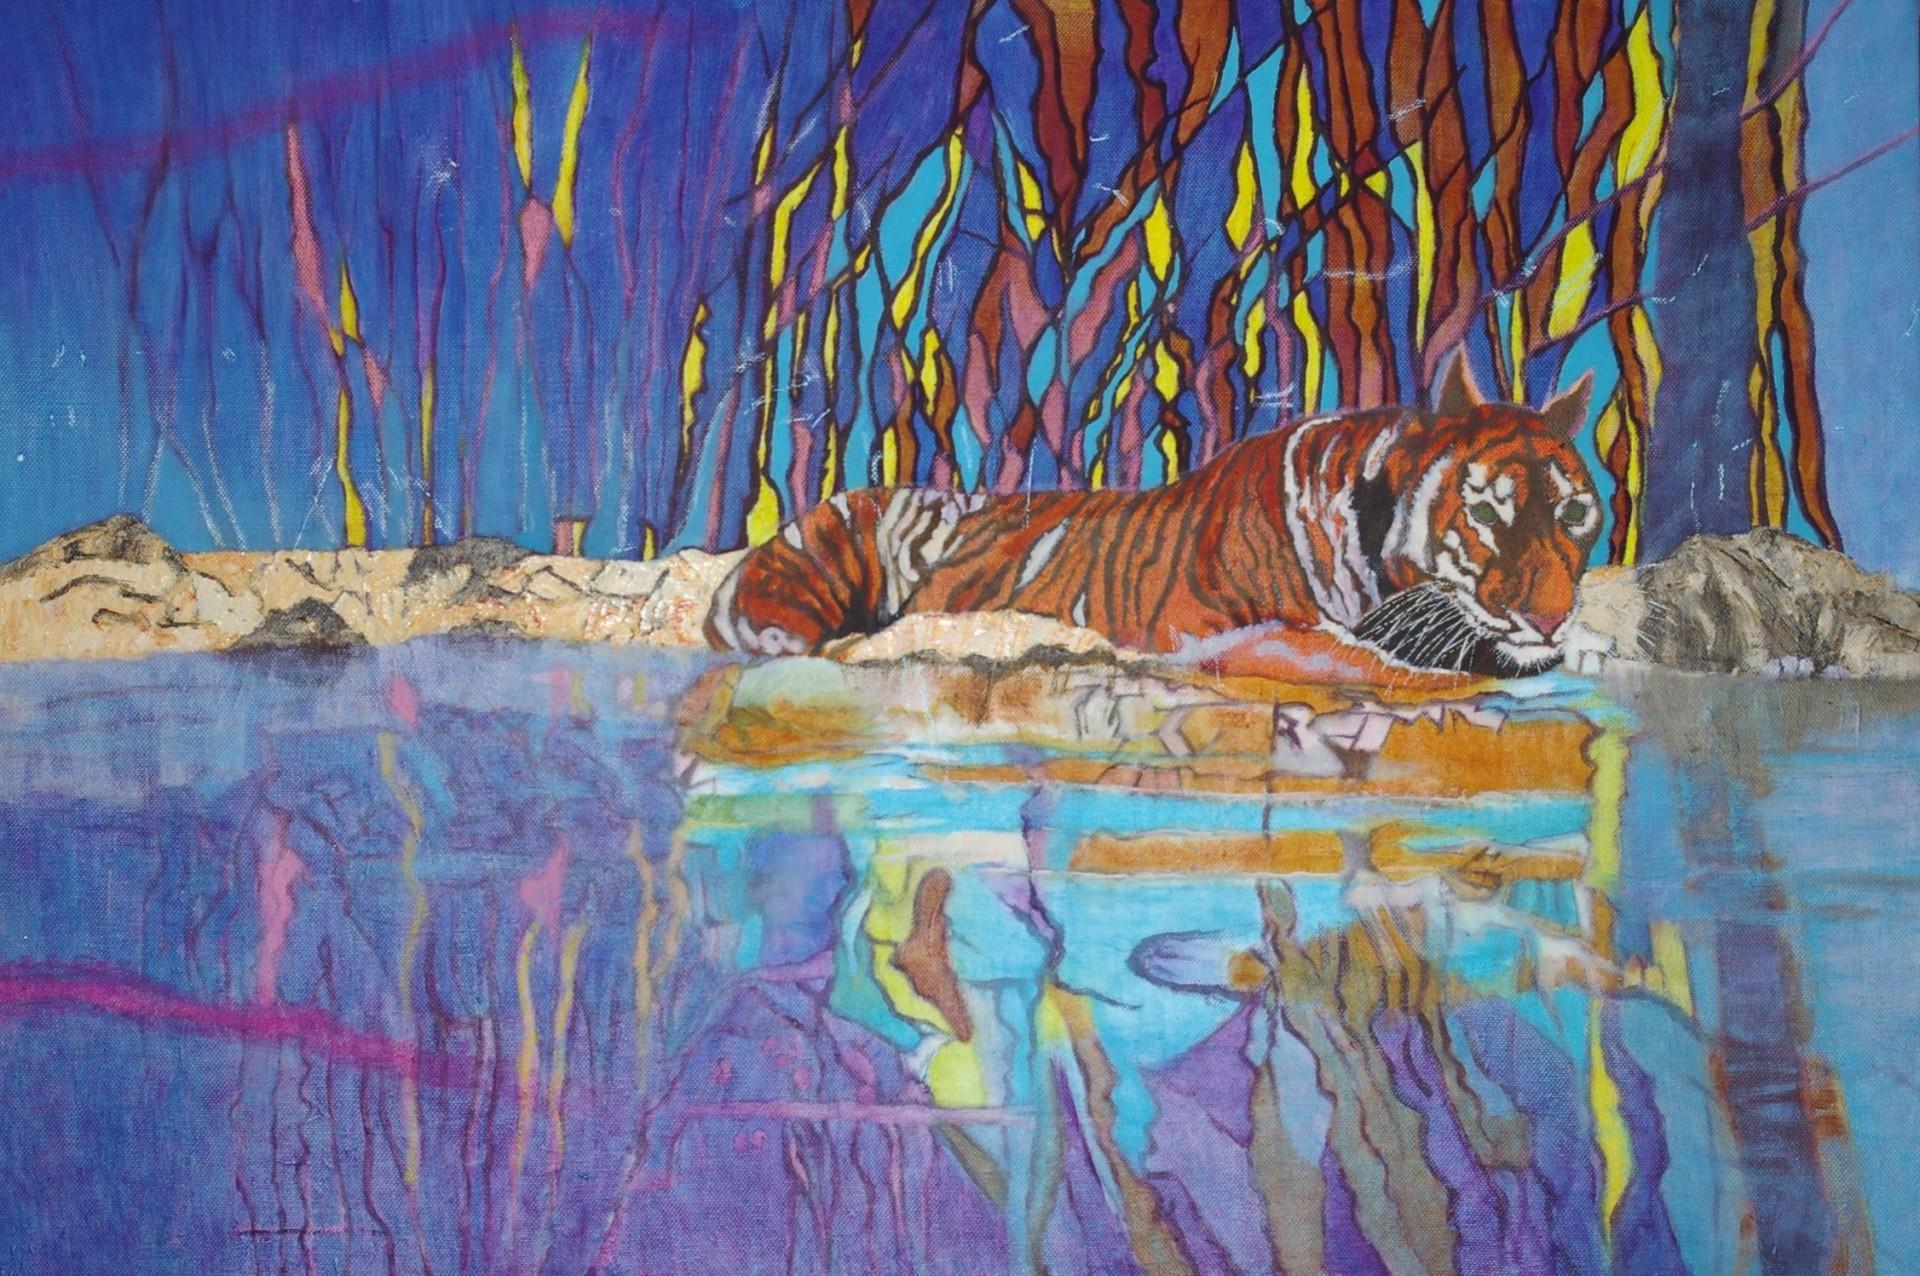 tiger burning bright sold